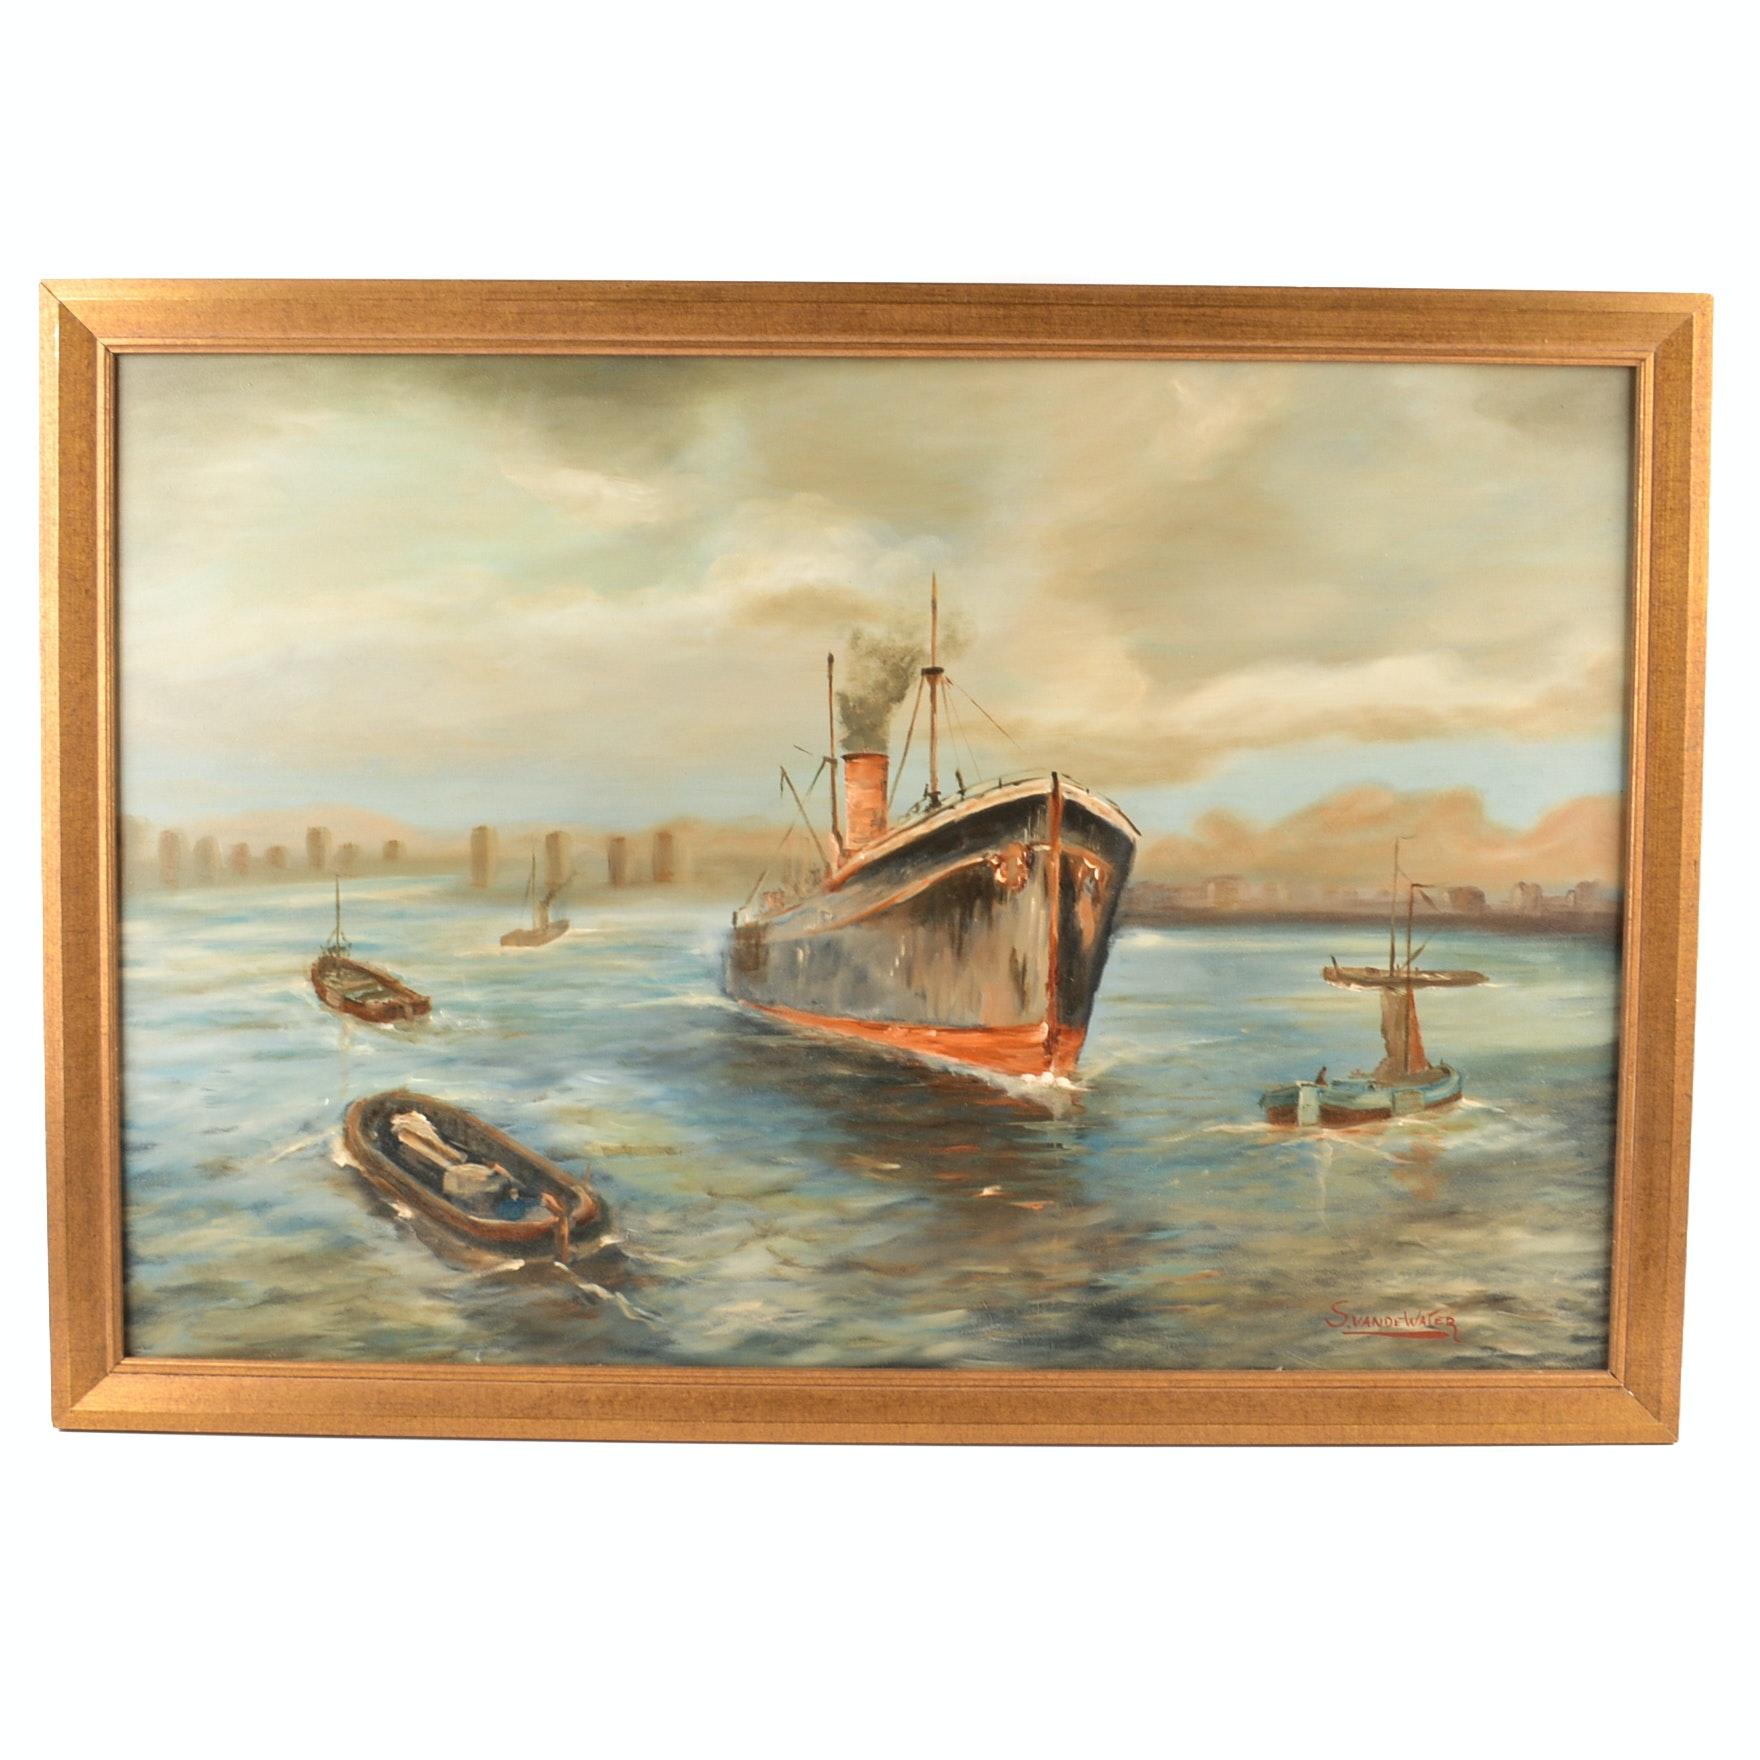 Sylvia van de Water Original Oil on Canvas Painting